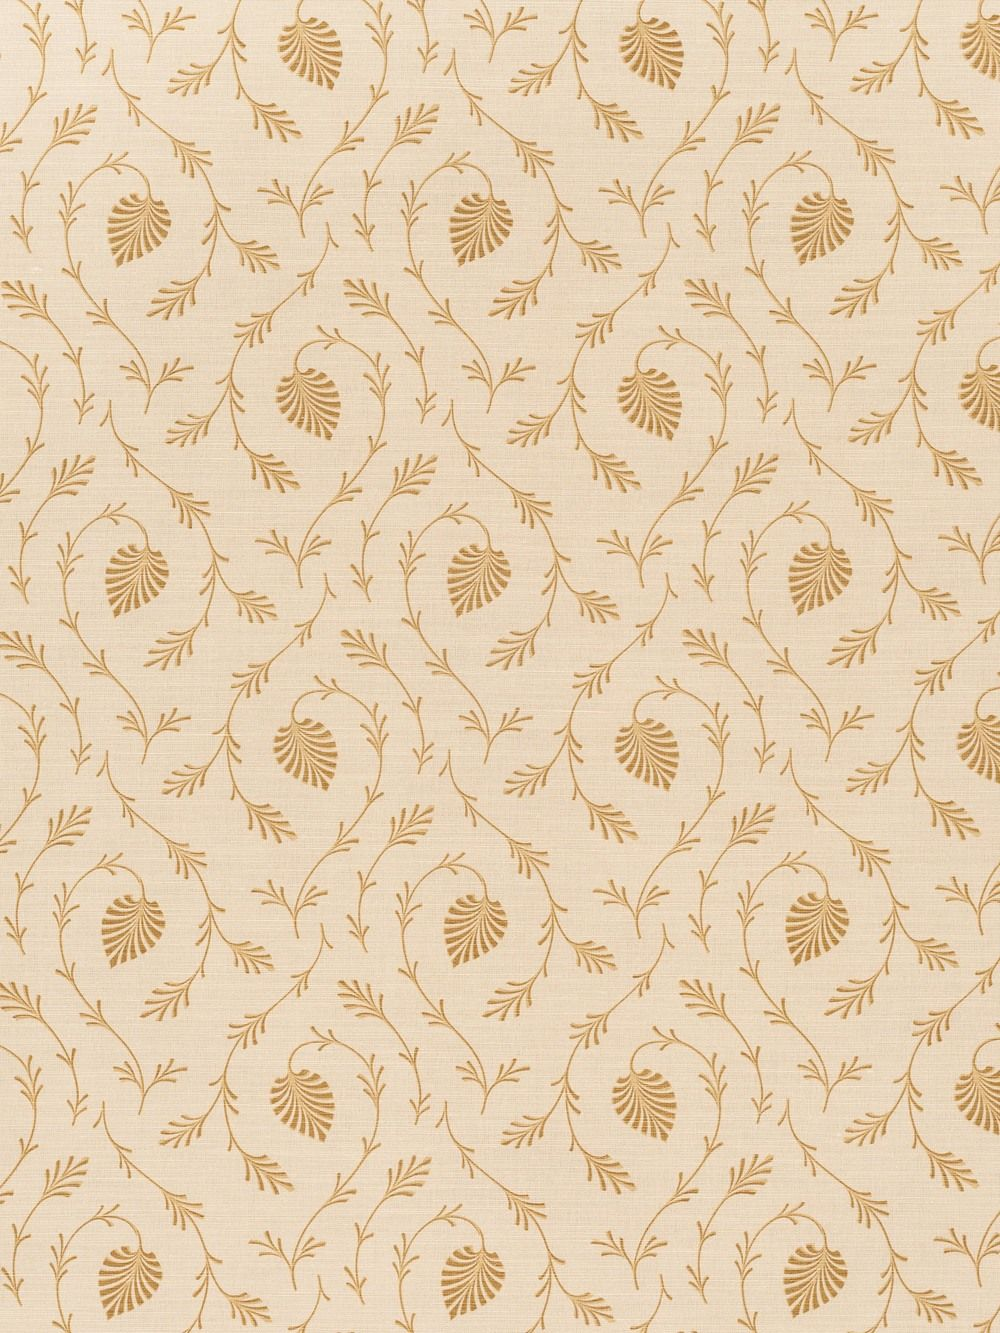 Designs G Q Block Printing Fabric Print Patterns Fabric